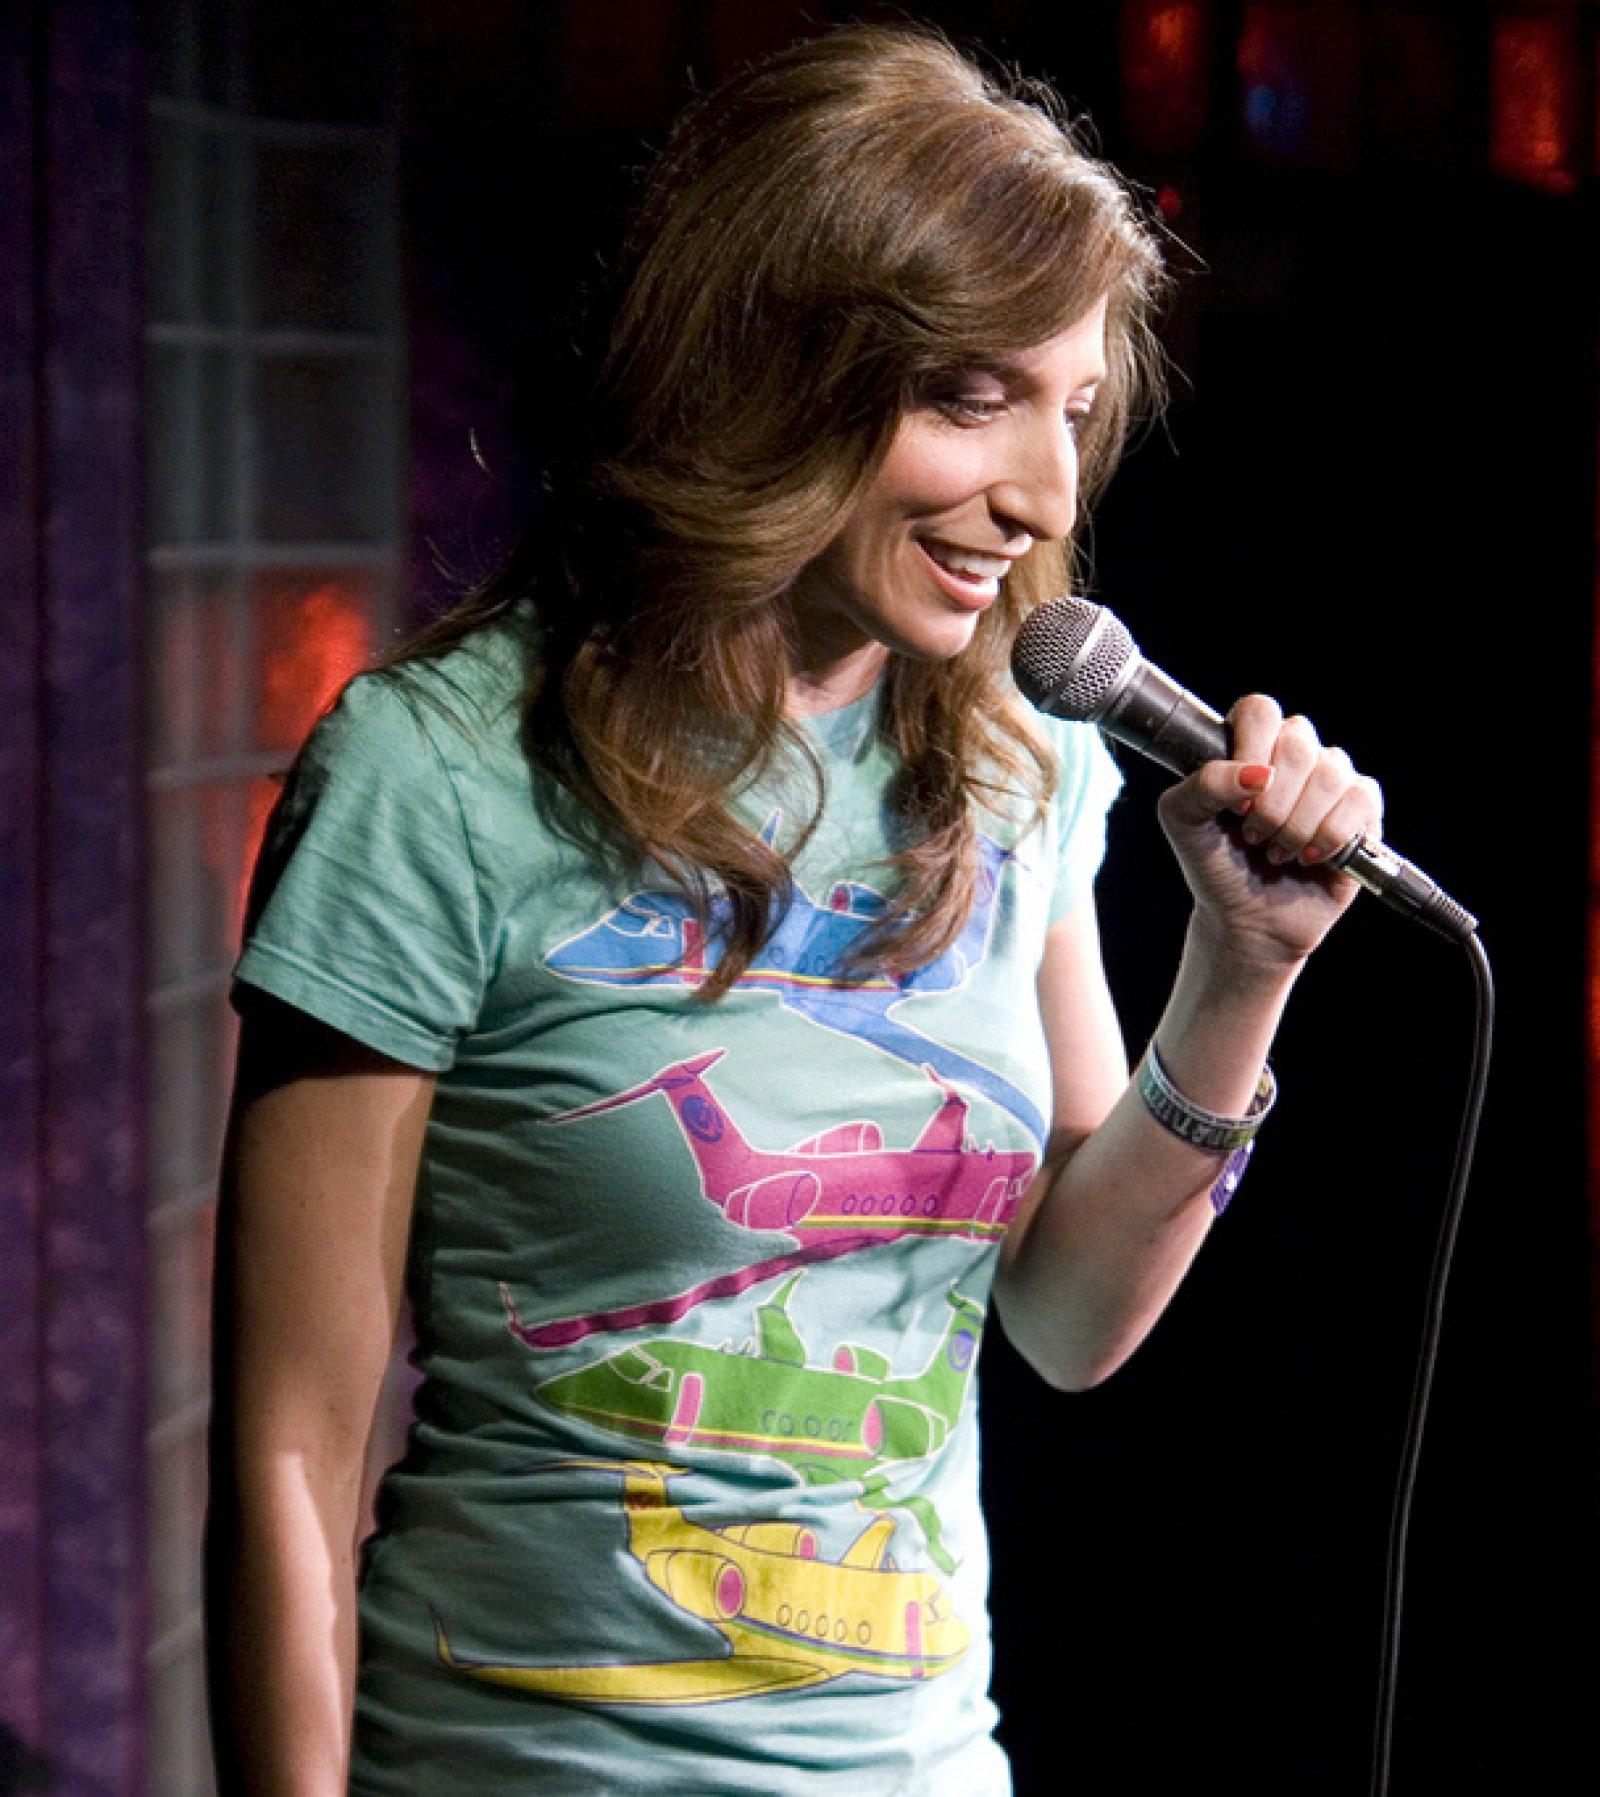 Comedians Jordan Peele Chelsea Peretti Engaged